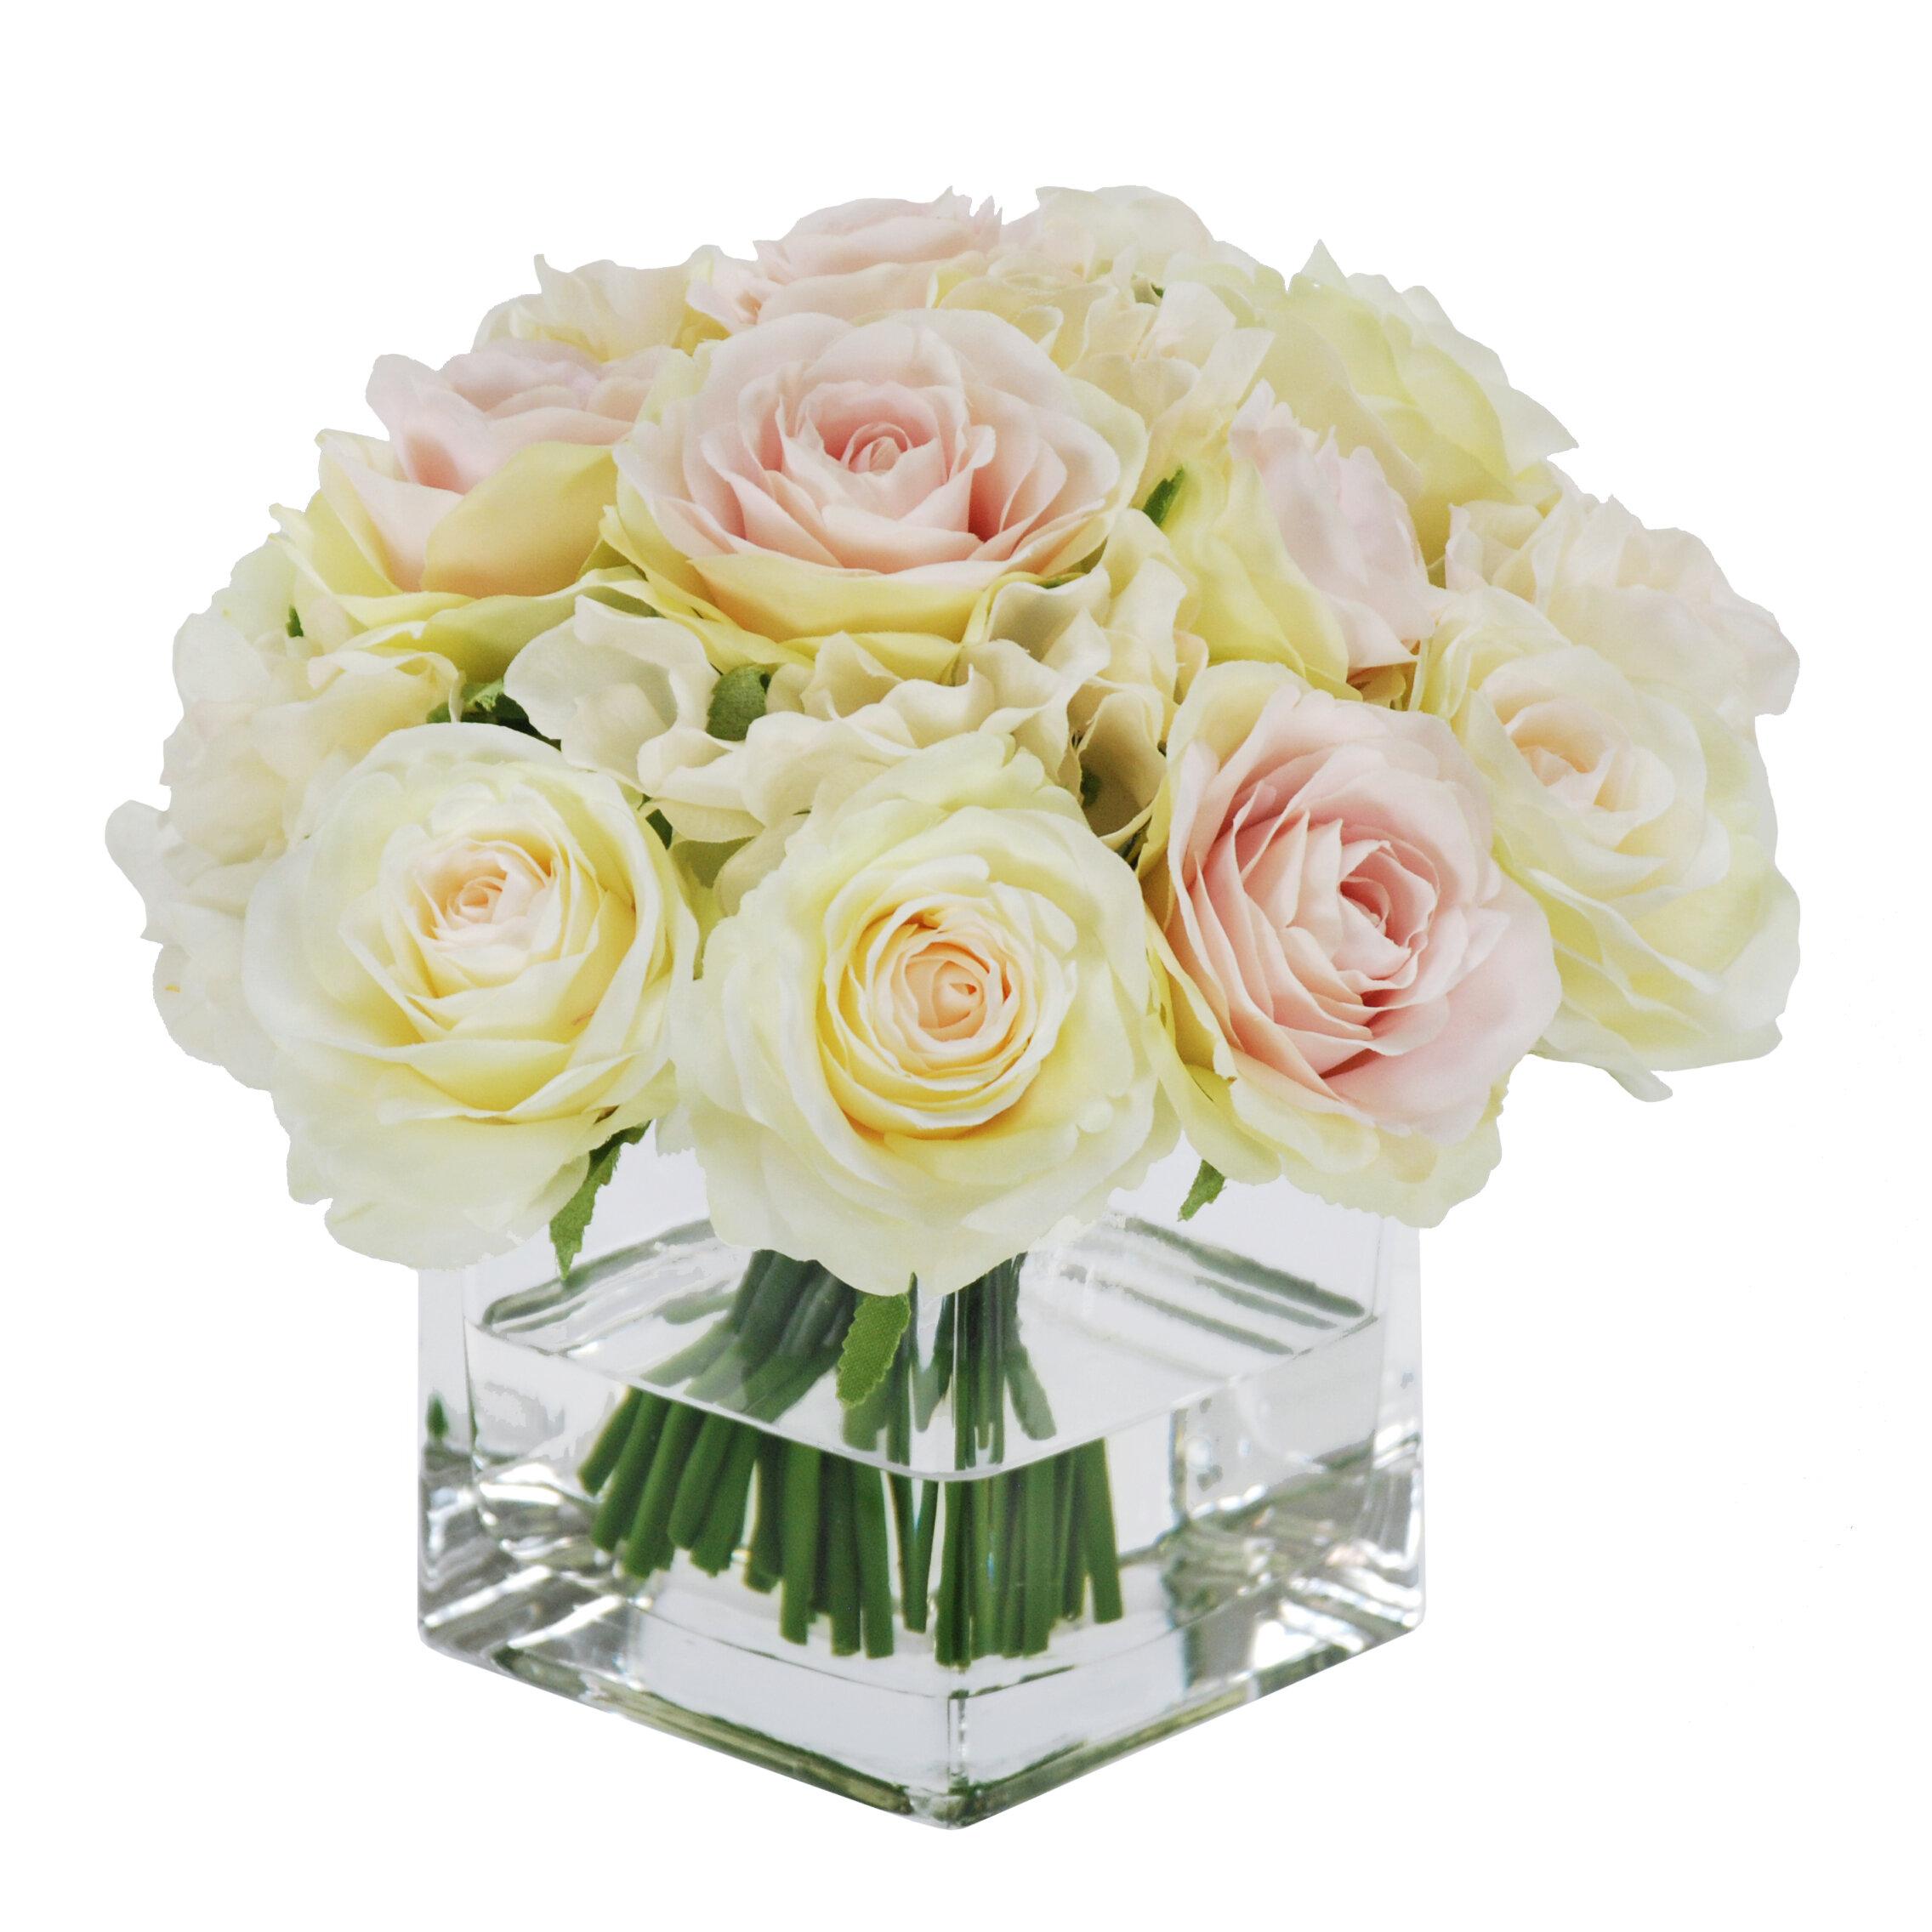 Winward Silks Rose Bouquet in Square Vase Floral Arrangements ...